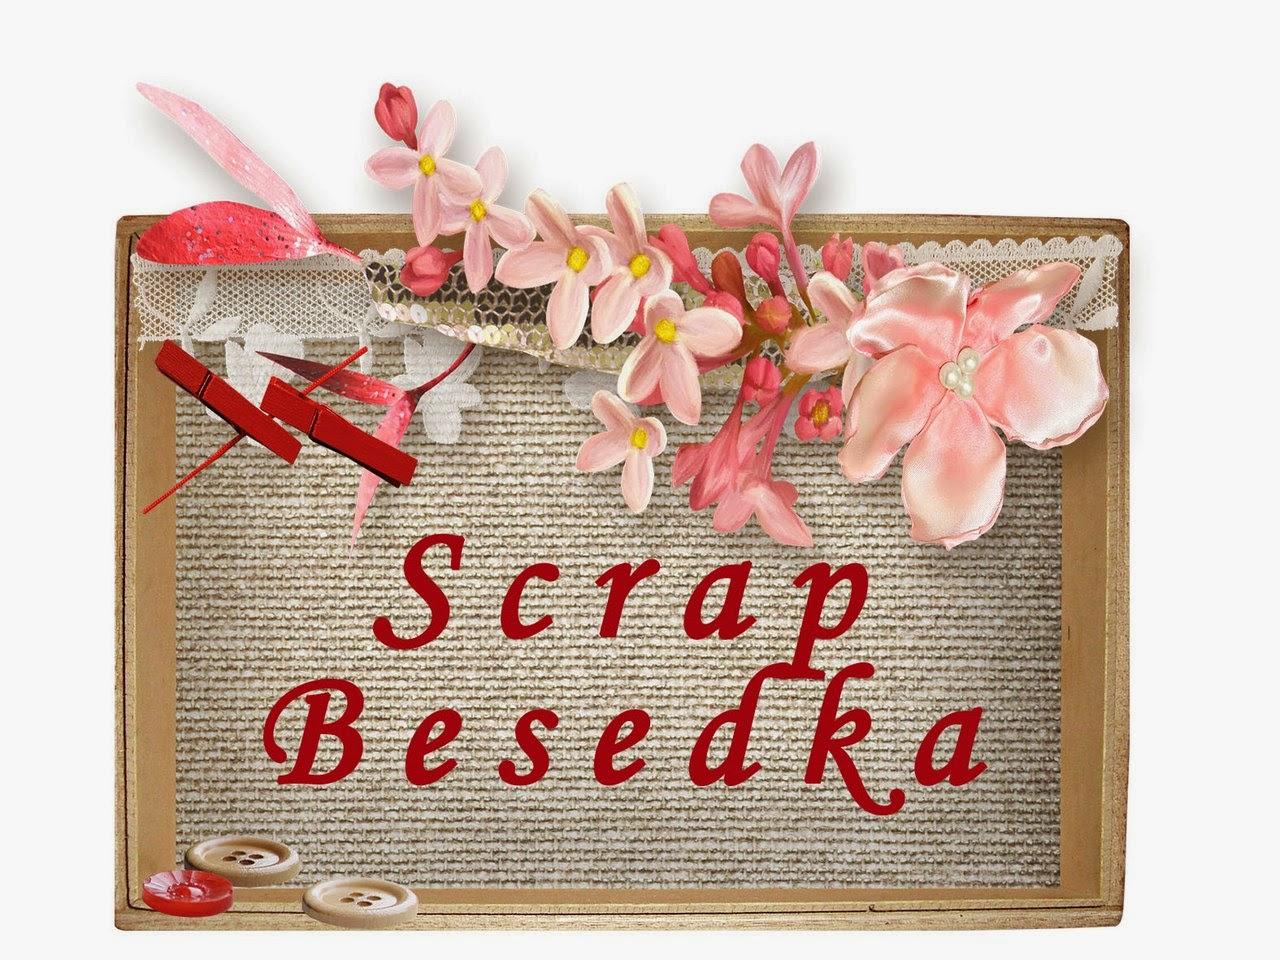 Scrap Besedka